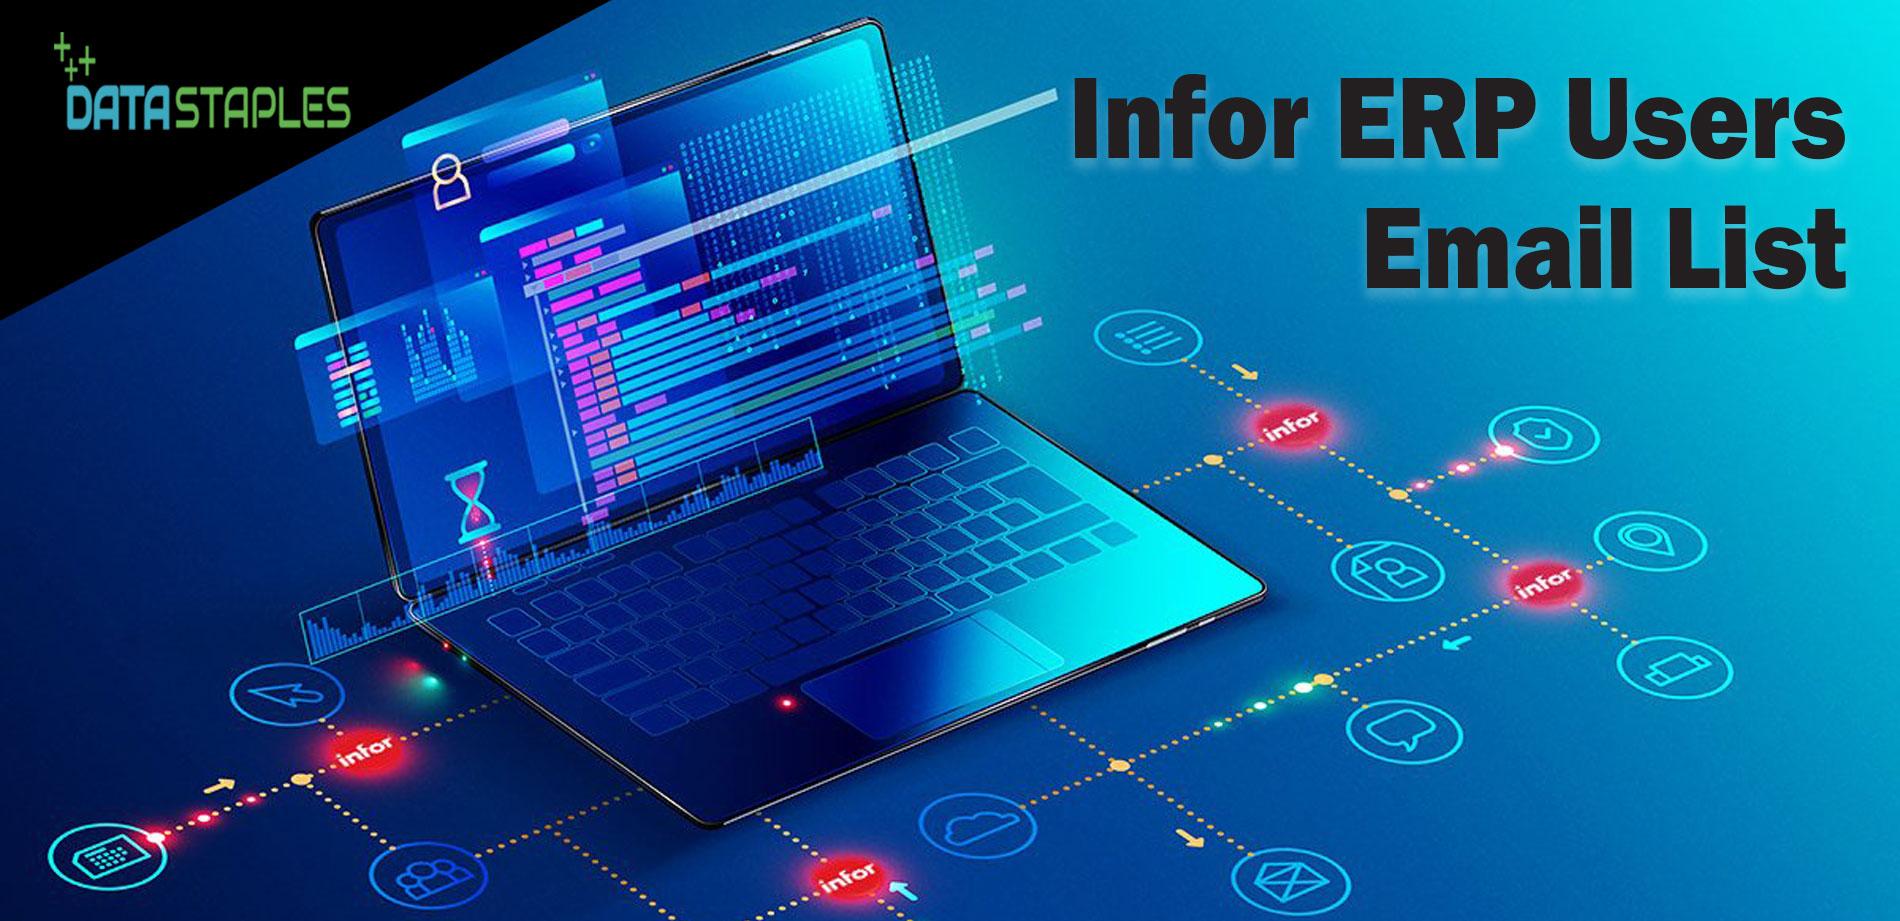 Infor ERP Users Mailing List | DataStaples